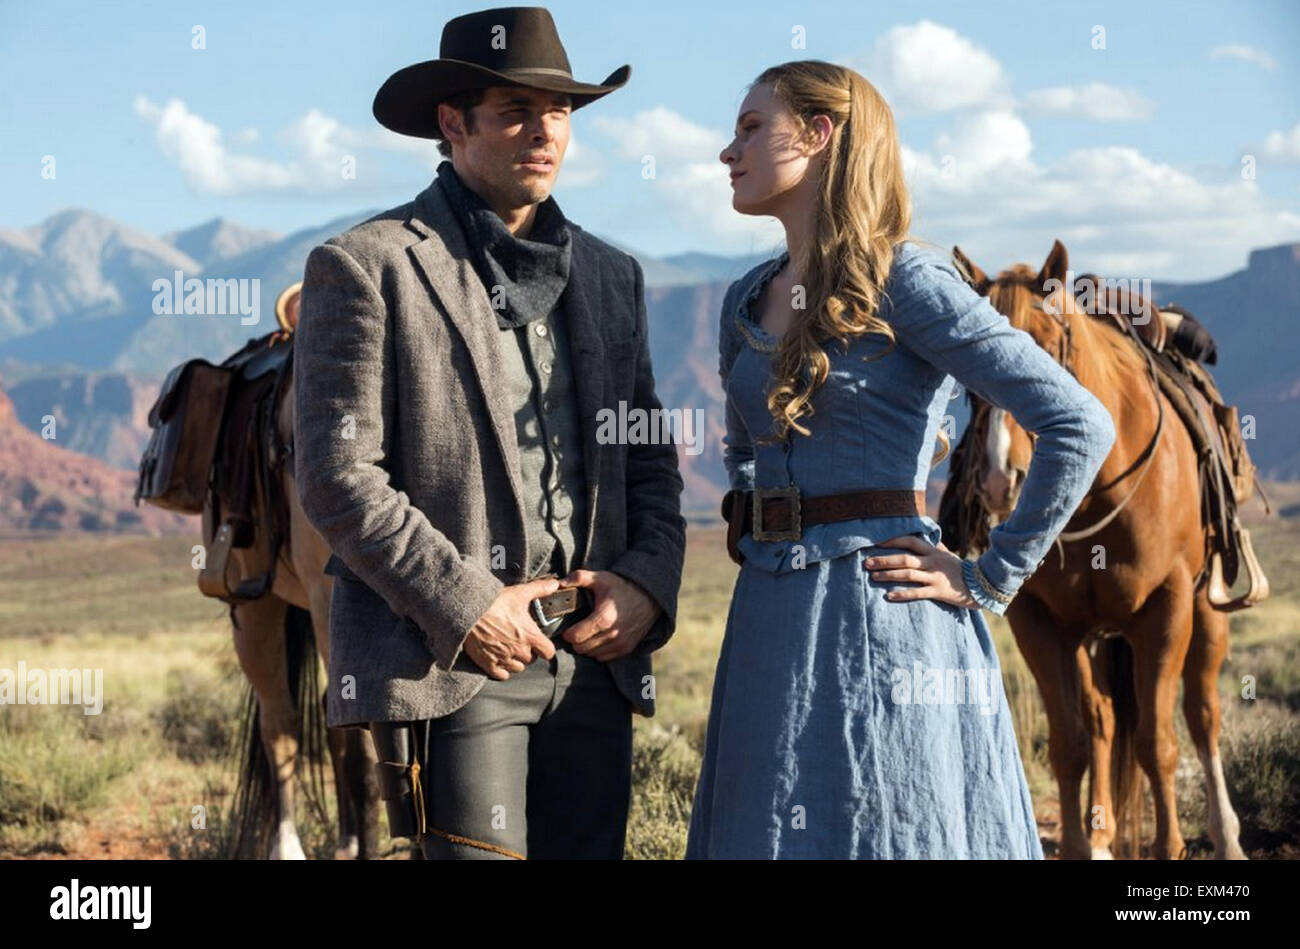 WESTWORLD 2015 HBO TV series with Evan Rachel Wood and James Marsden - Stock Image